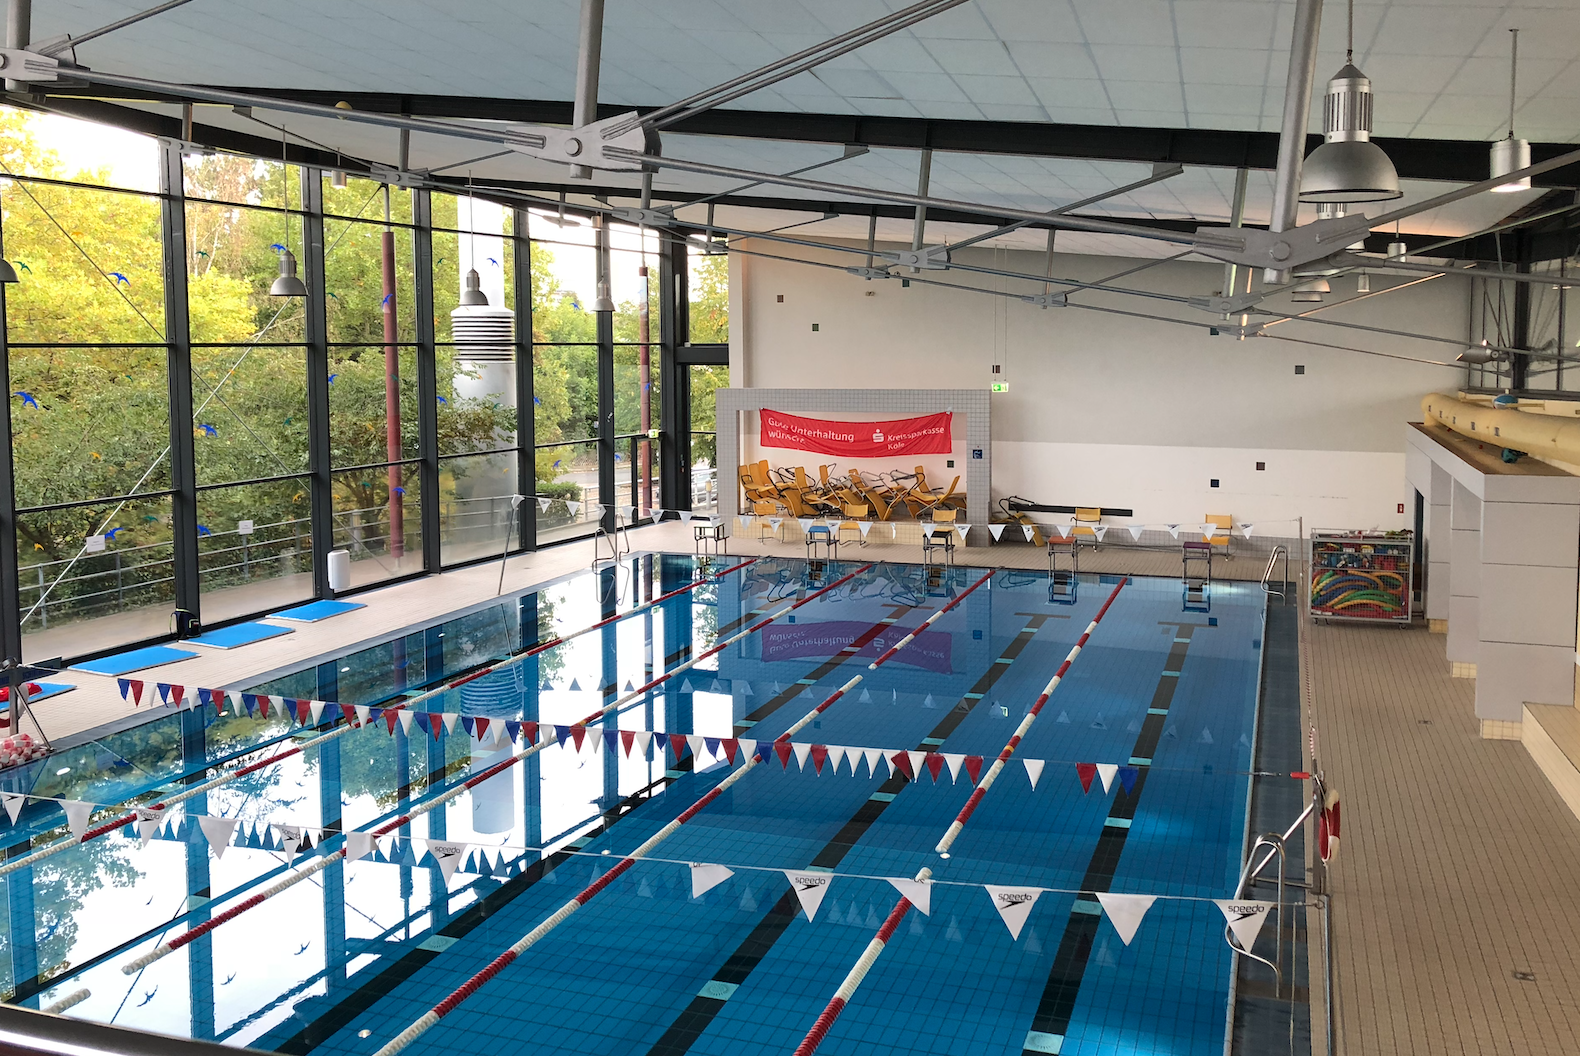 Das Aqua vor Beginn des Wettkampfes 2018.